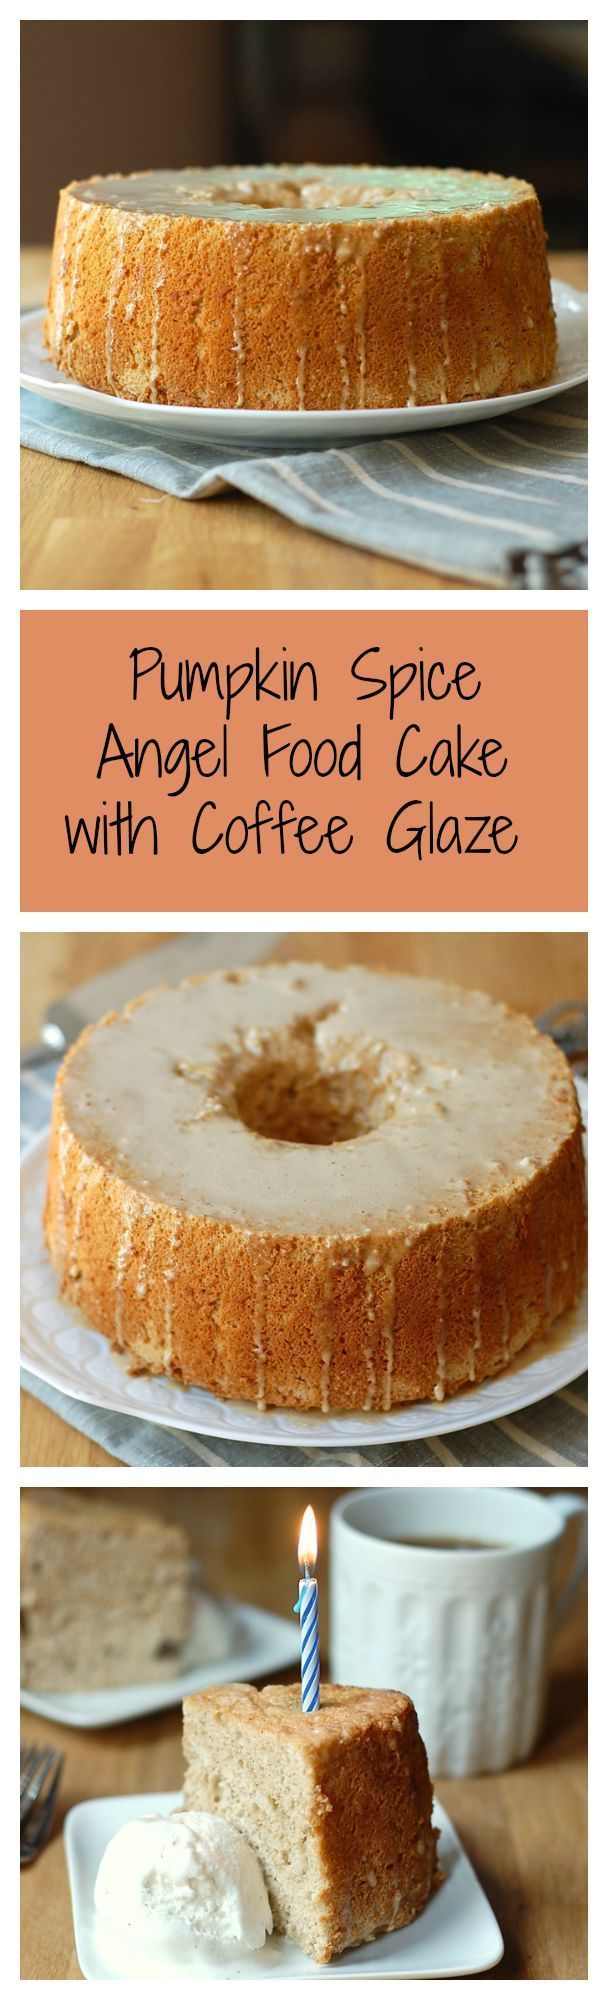 pumpkin spice angel food cake